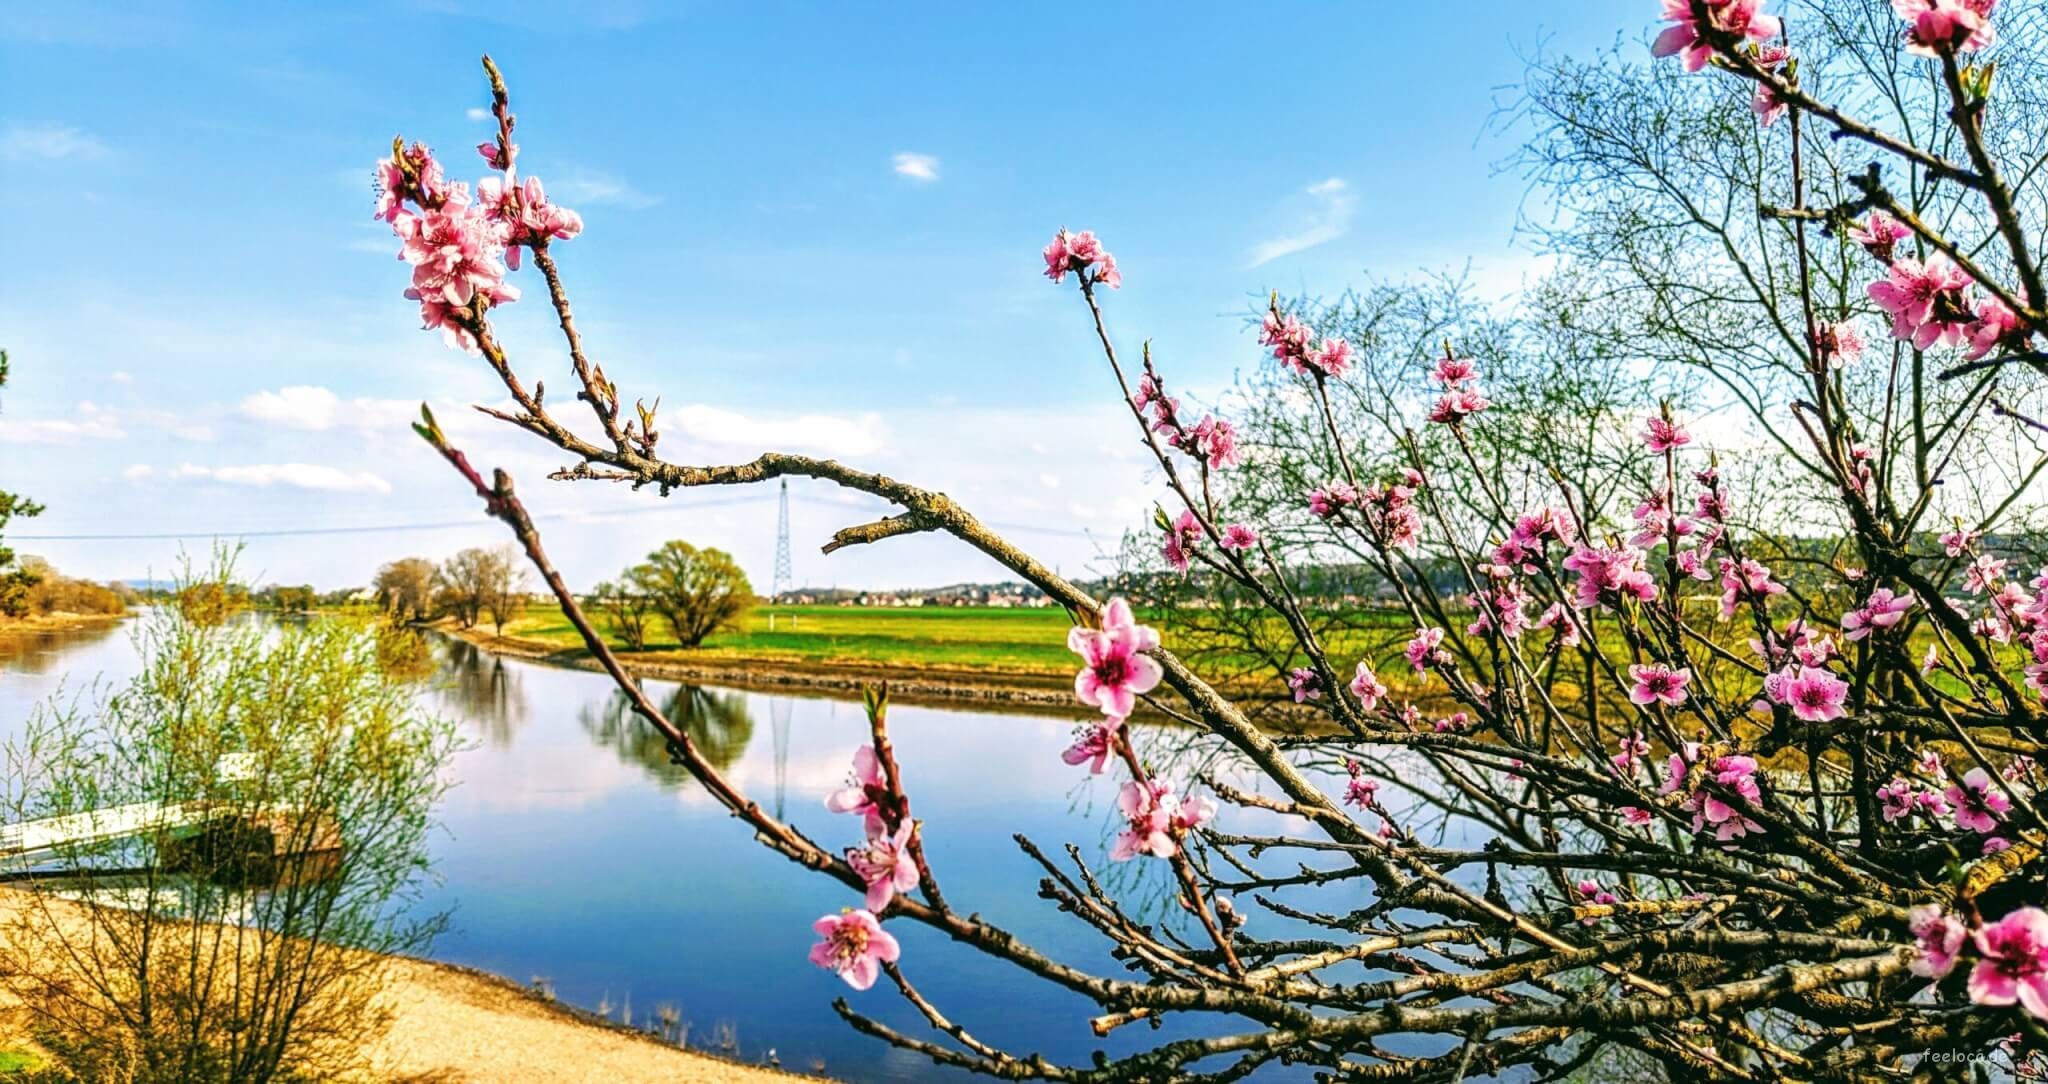 Spring Season - Blossom Season